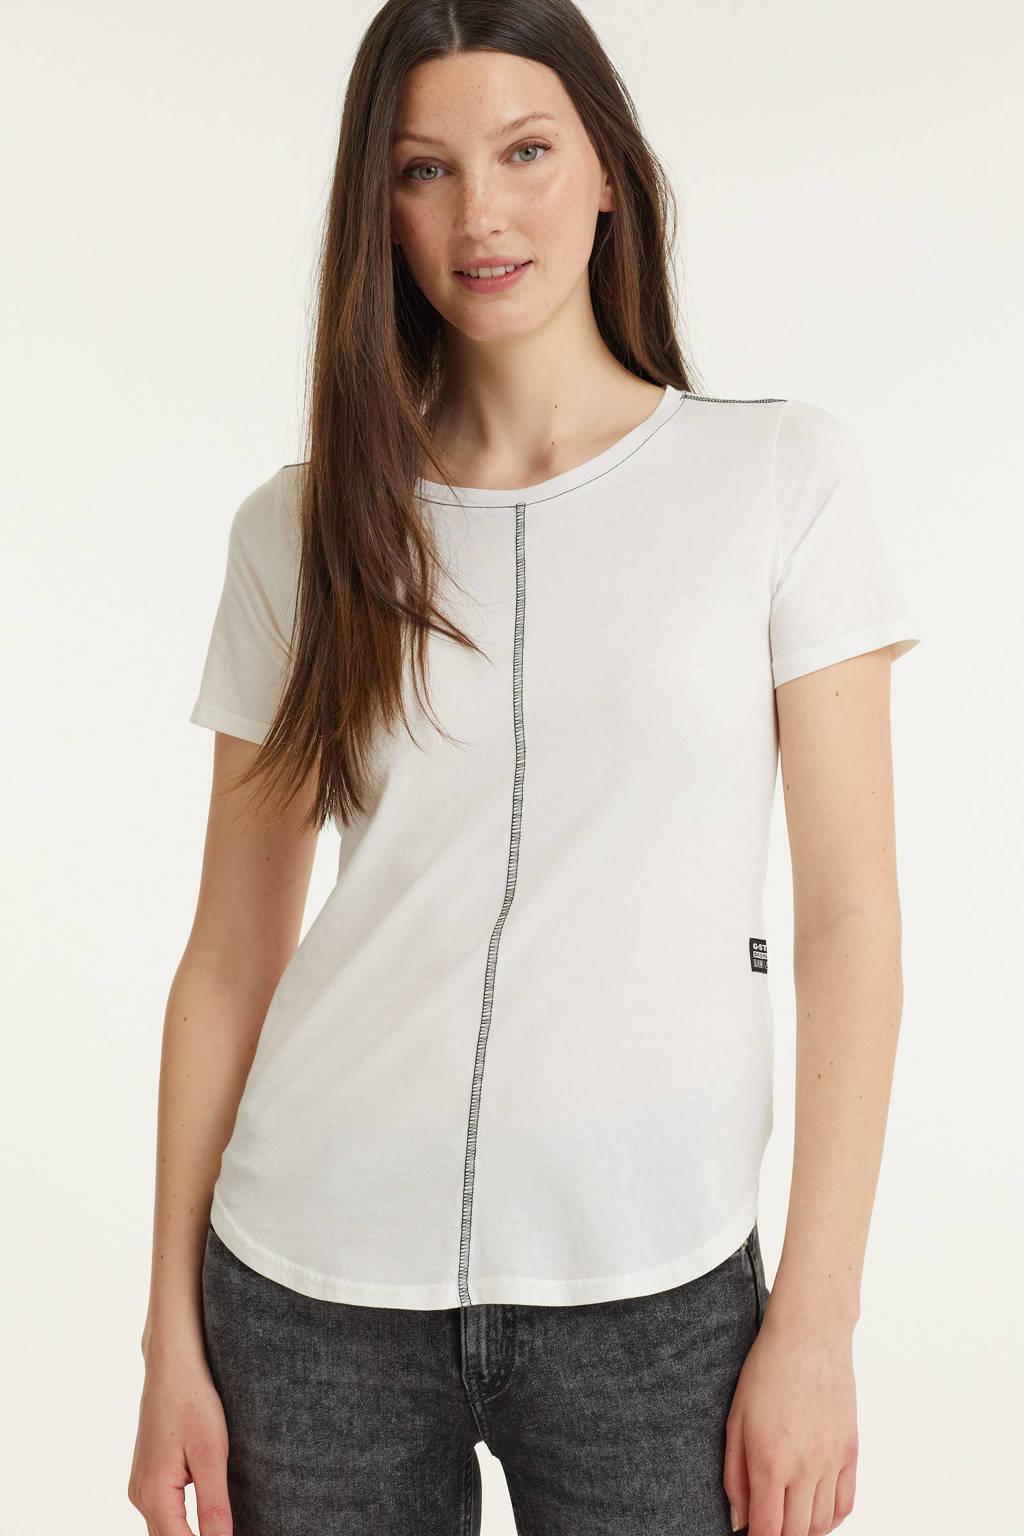 G-Star RAW T-shirt van biologisch katoen off white, Off White